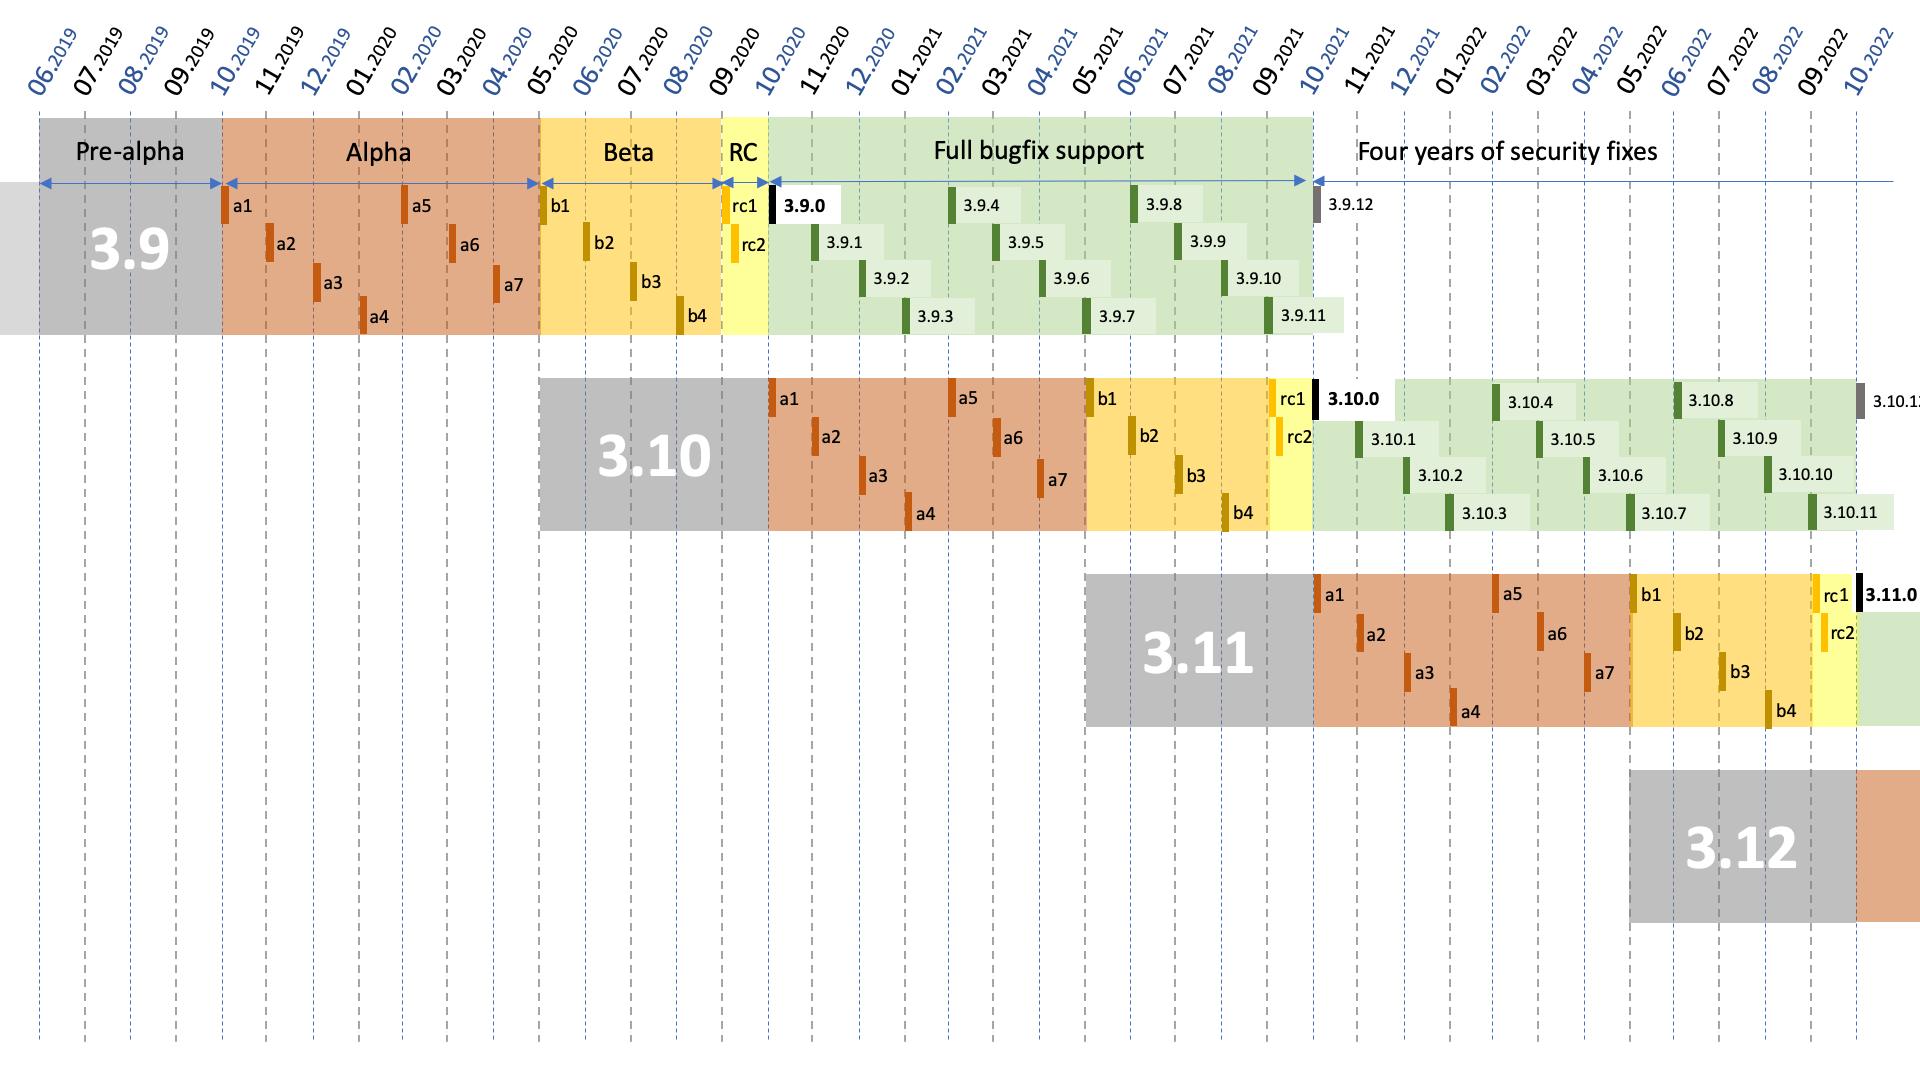 pep-0602-example-release-calendar.png